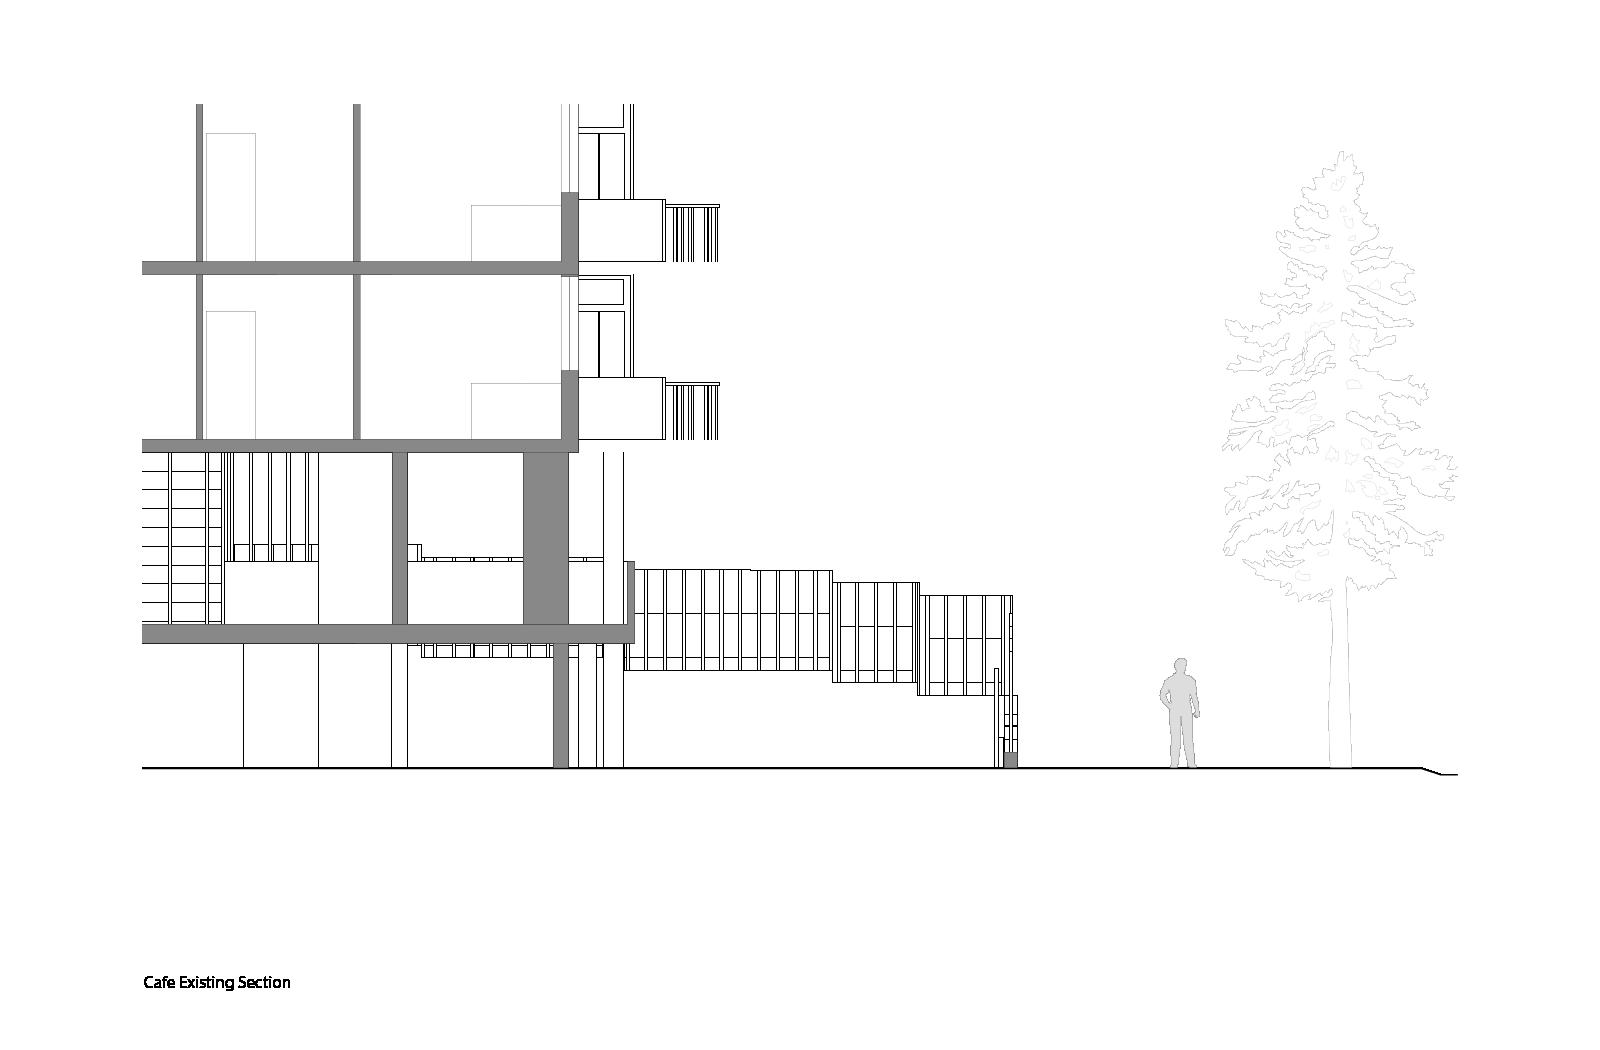 58 Carr street - adaptive reuse diagrams McGregor Westlake Architecture